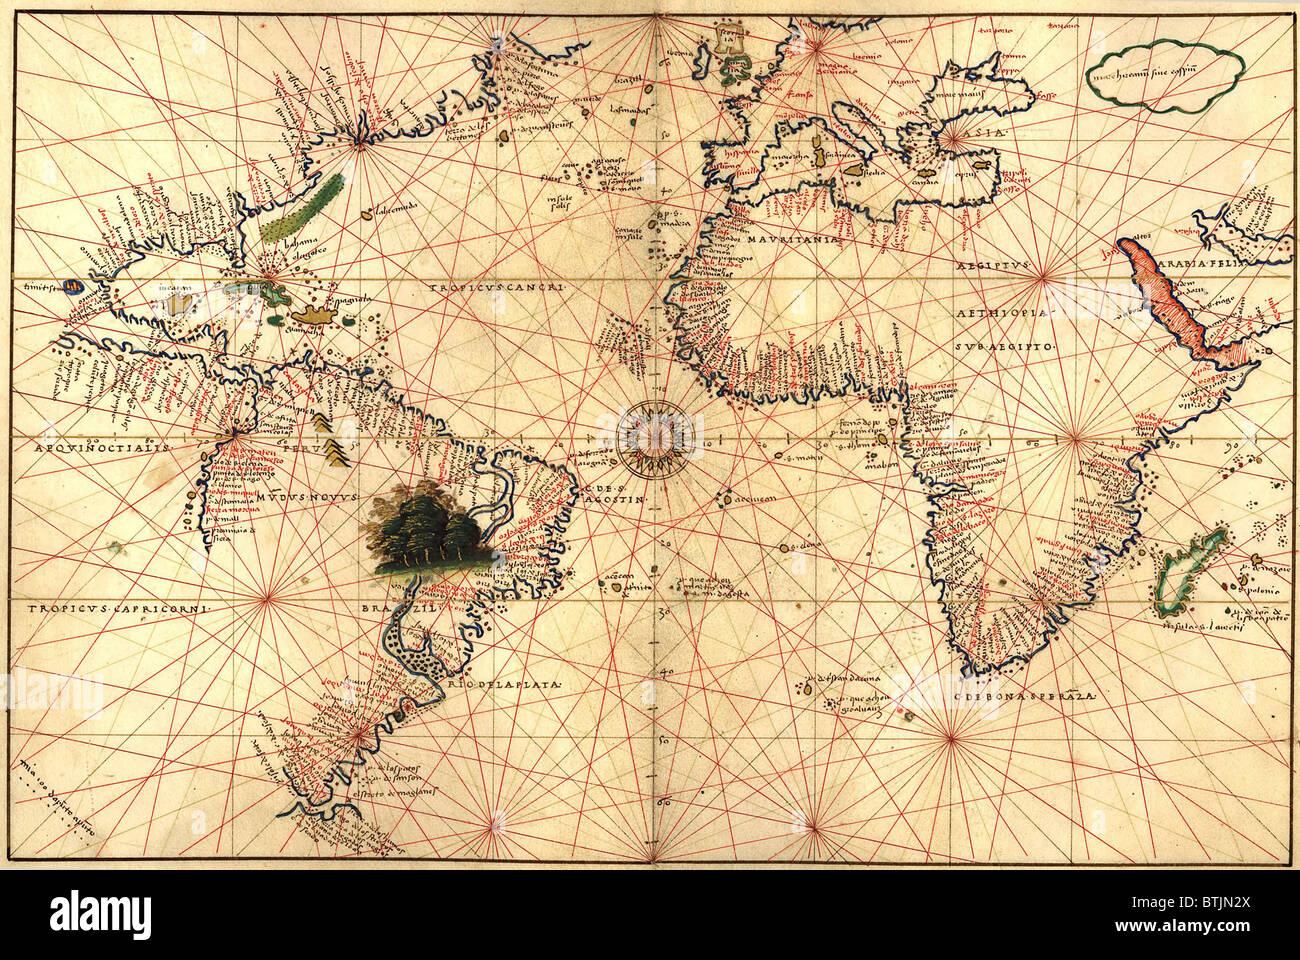 Piri Reis Karte Atlantis.Seekarten Stockfotos Seekarten Bilder Alamy